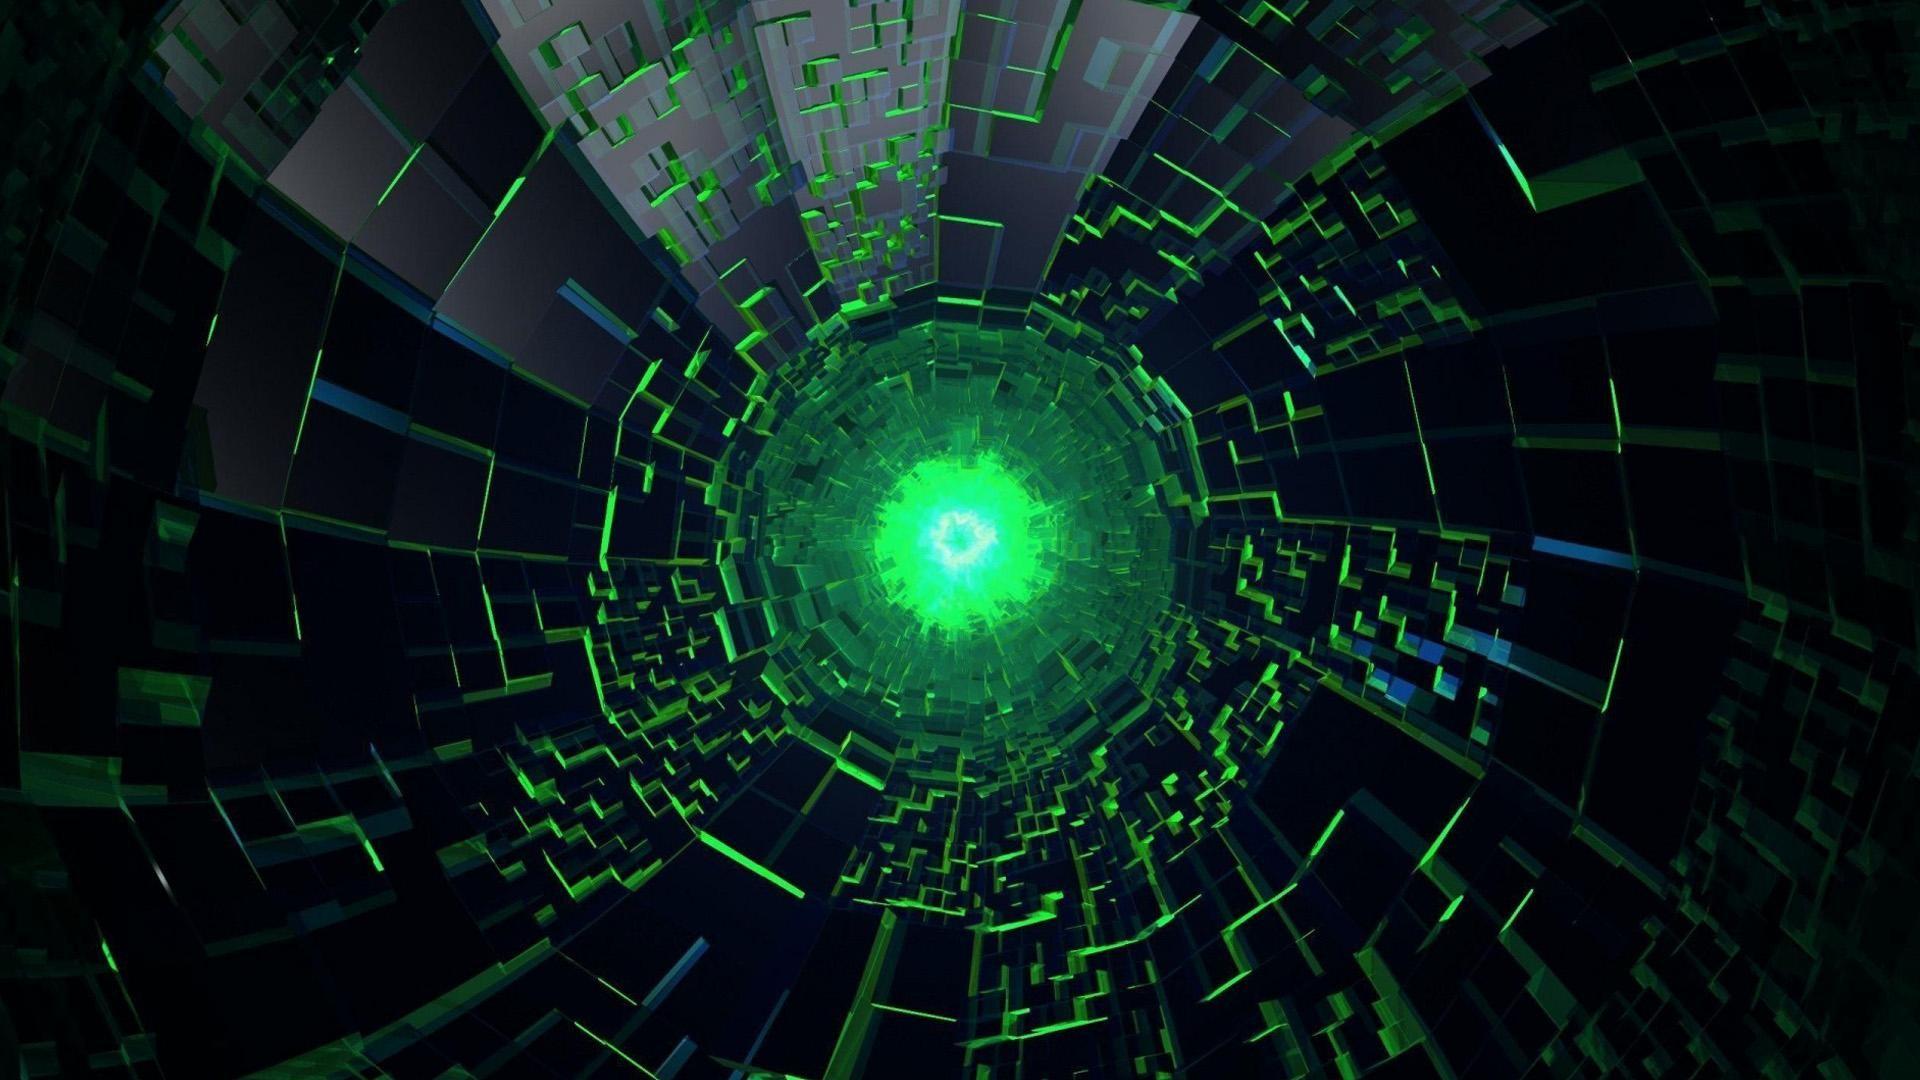 wallpaper.wiki-Green-Neon-Desktop-Images-PIC-WPD004337